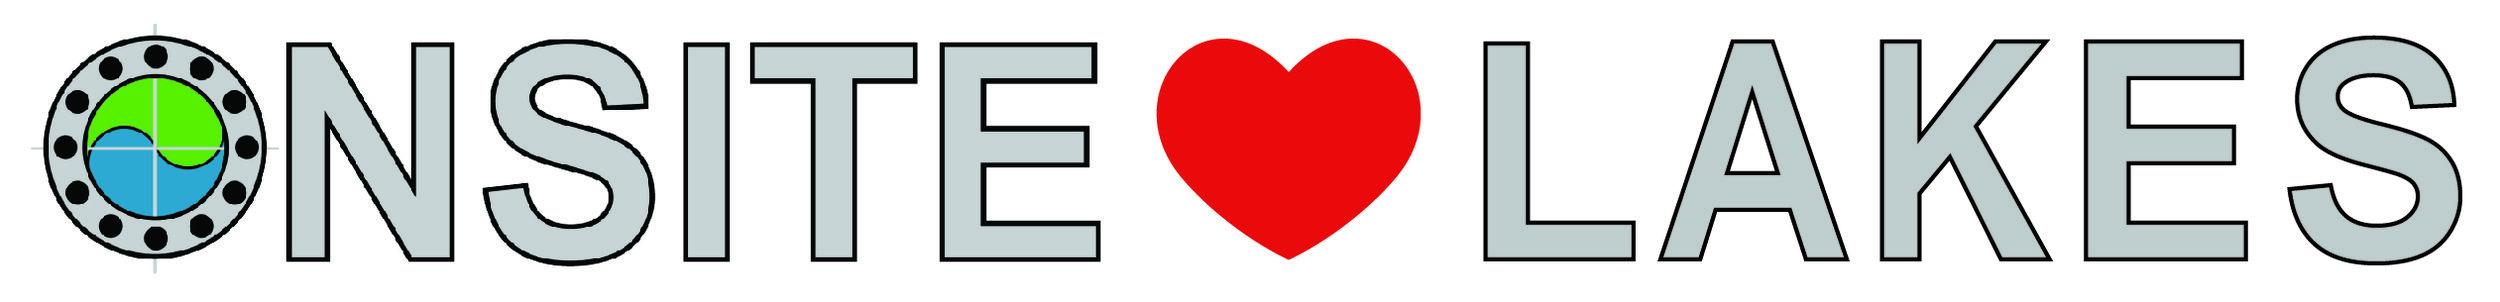 ONSITE HEART LAKES good file.jpg